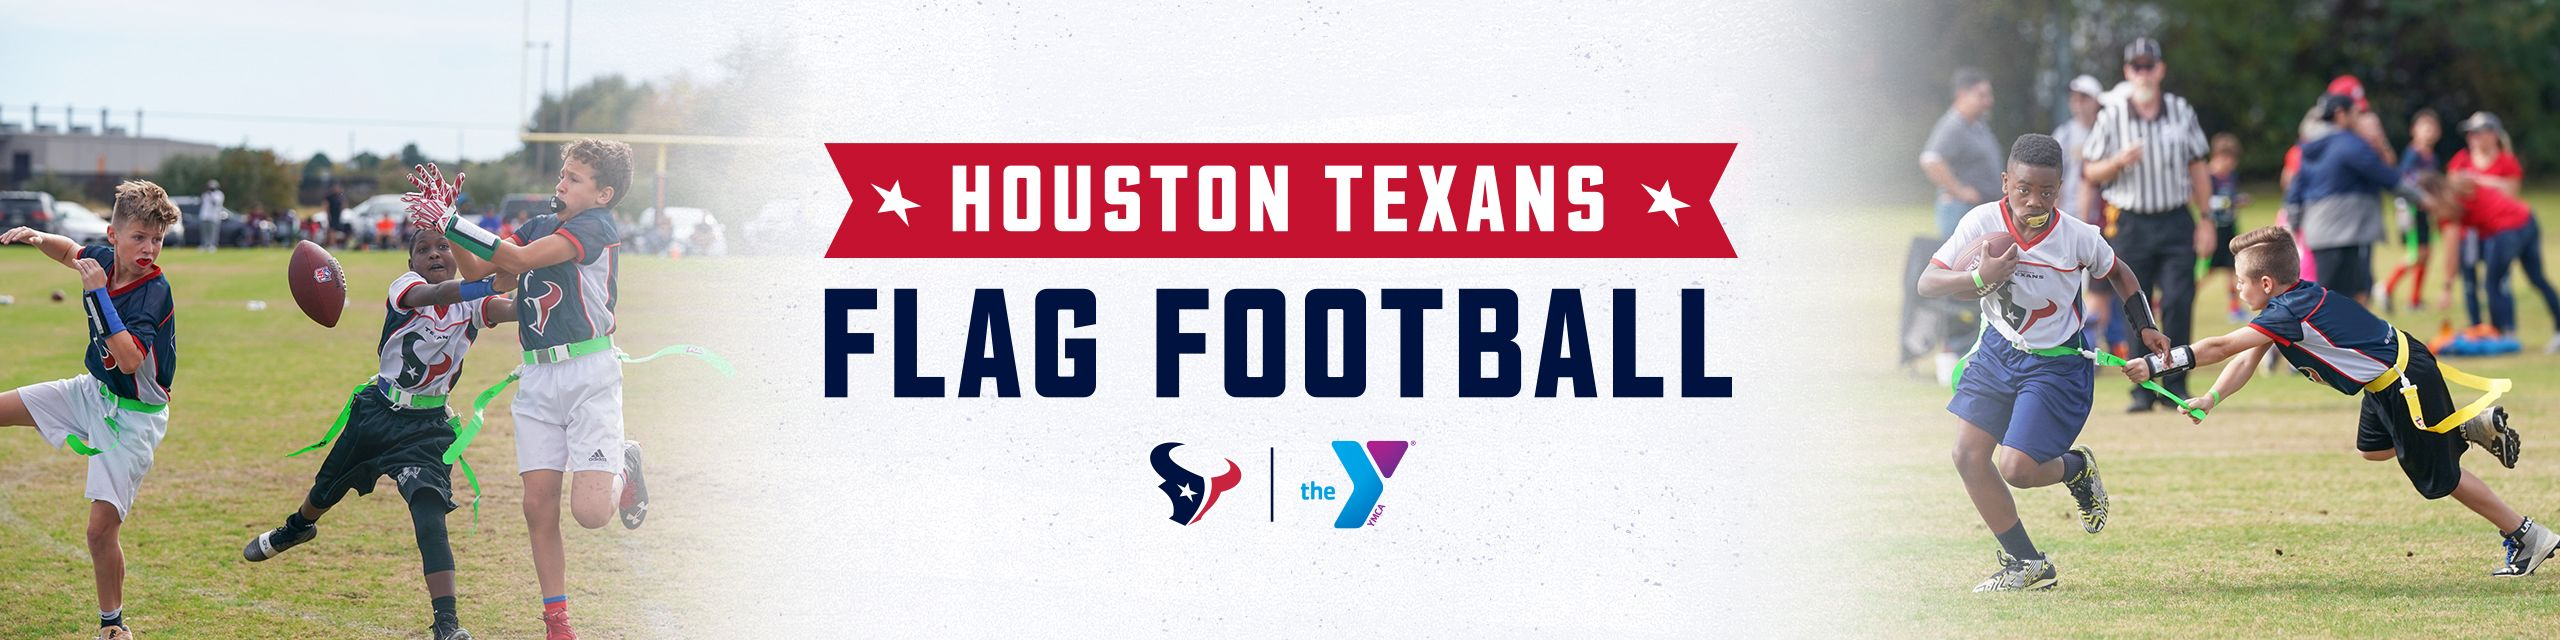 Houston Texans Flag Football with the YMCA